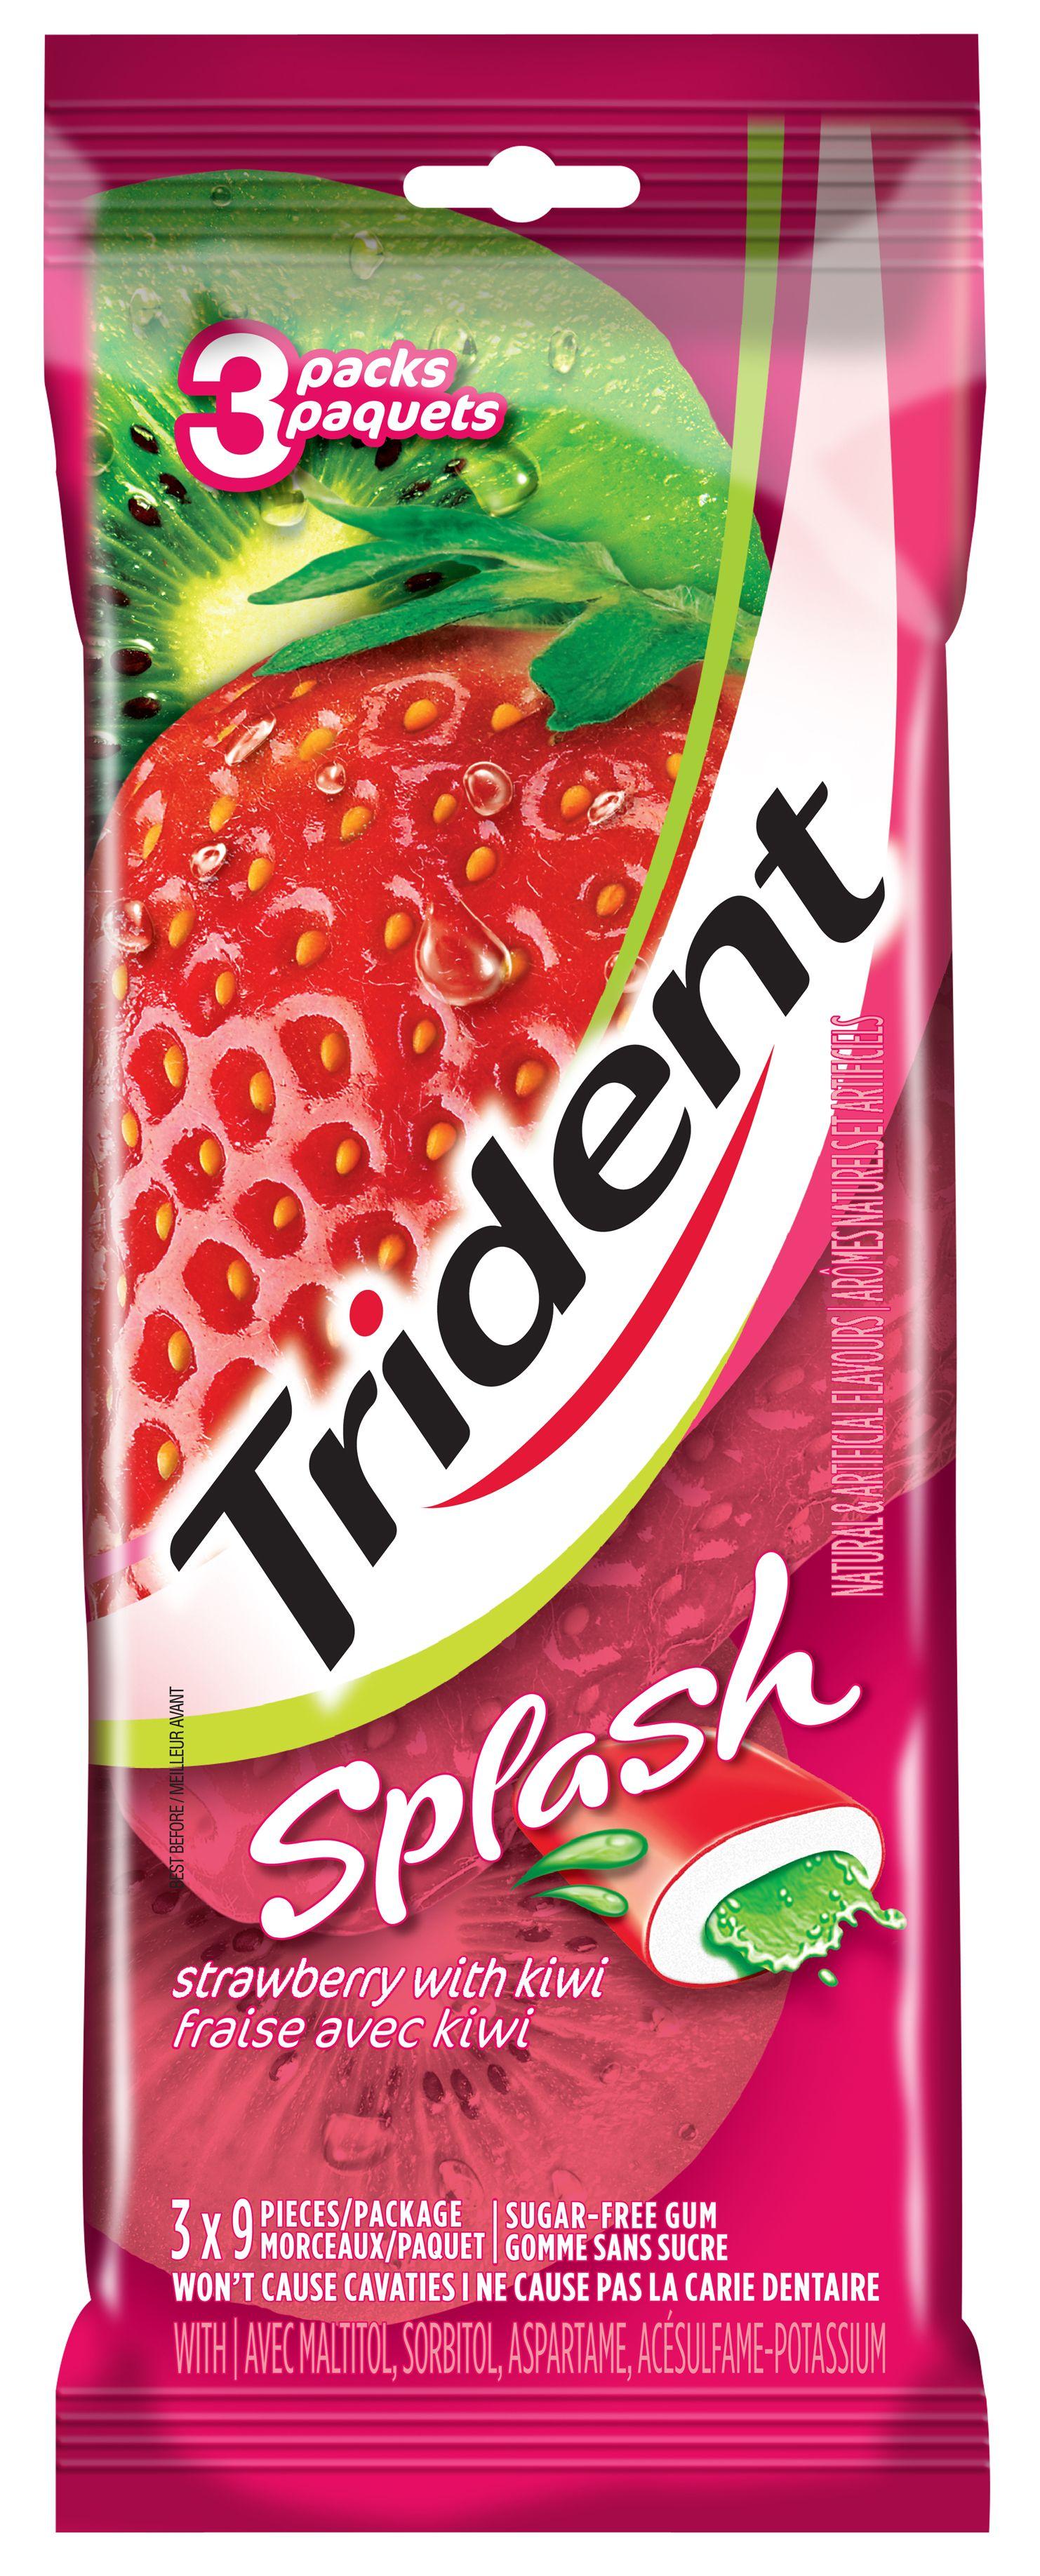 TRIDENT Splash FRAISE KIWI 27 1N